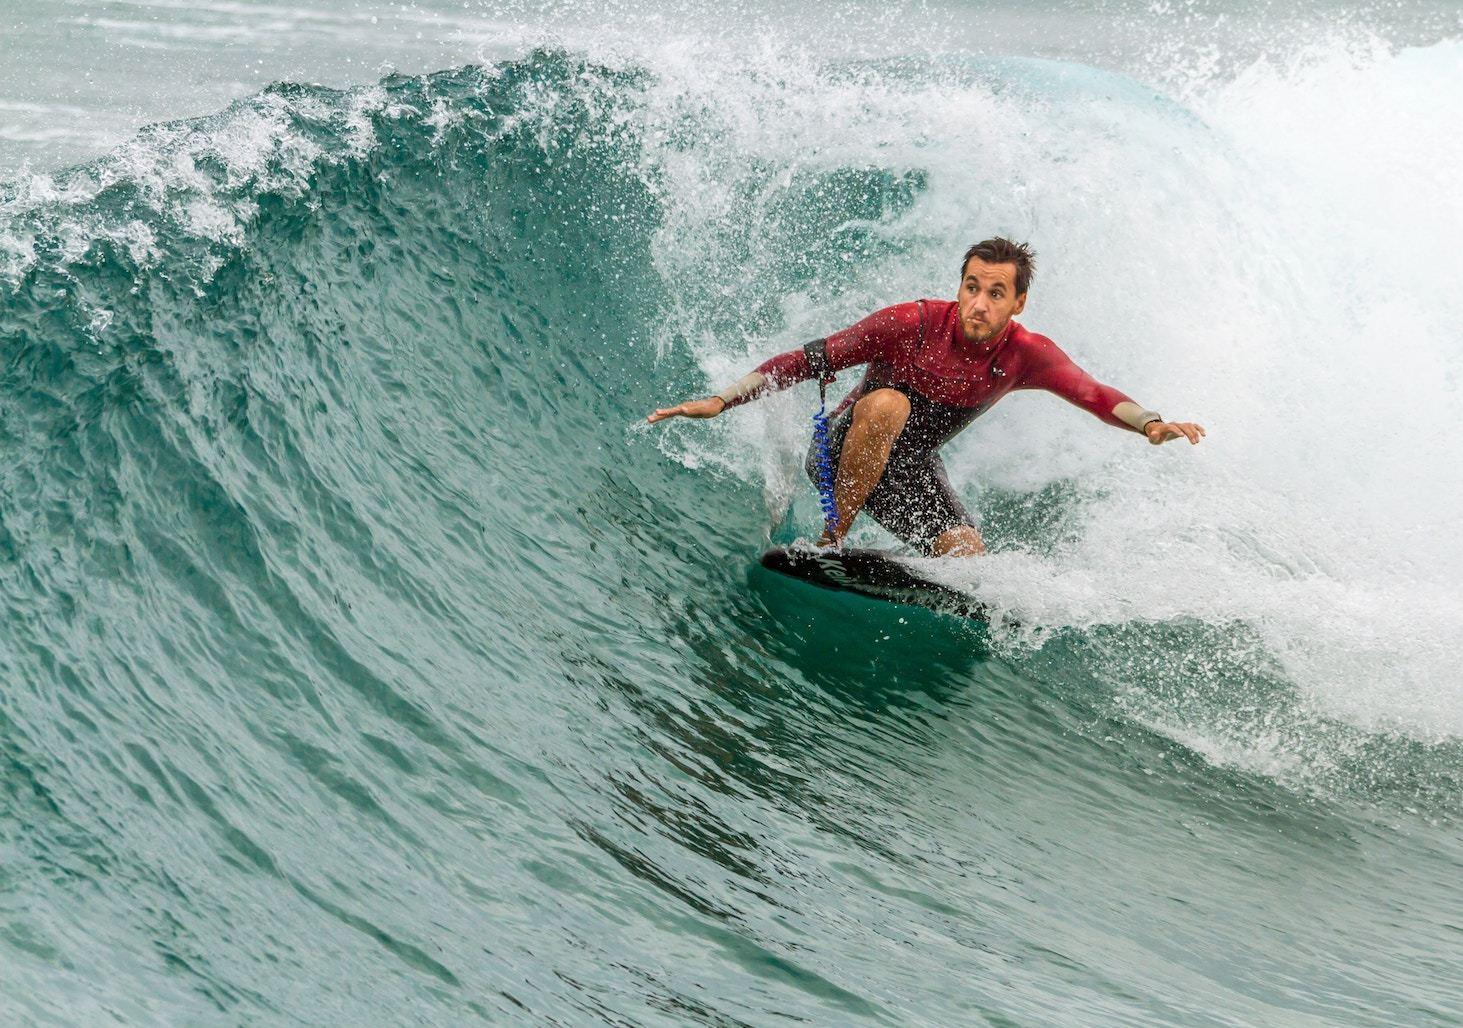 a man surfs in a red splashguard